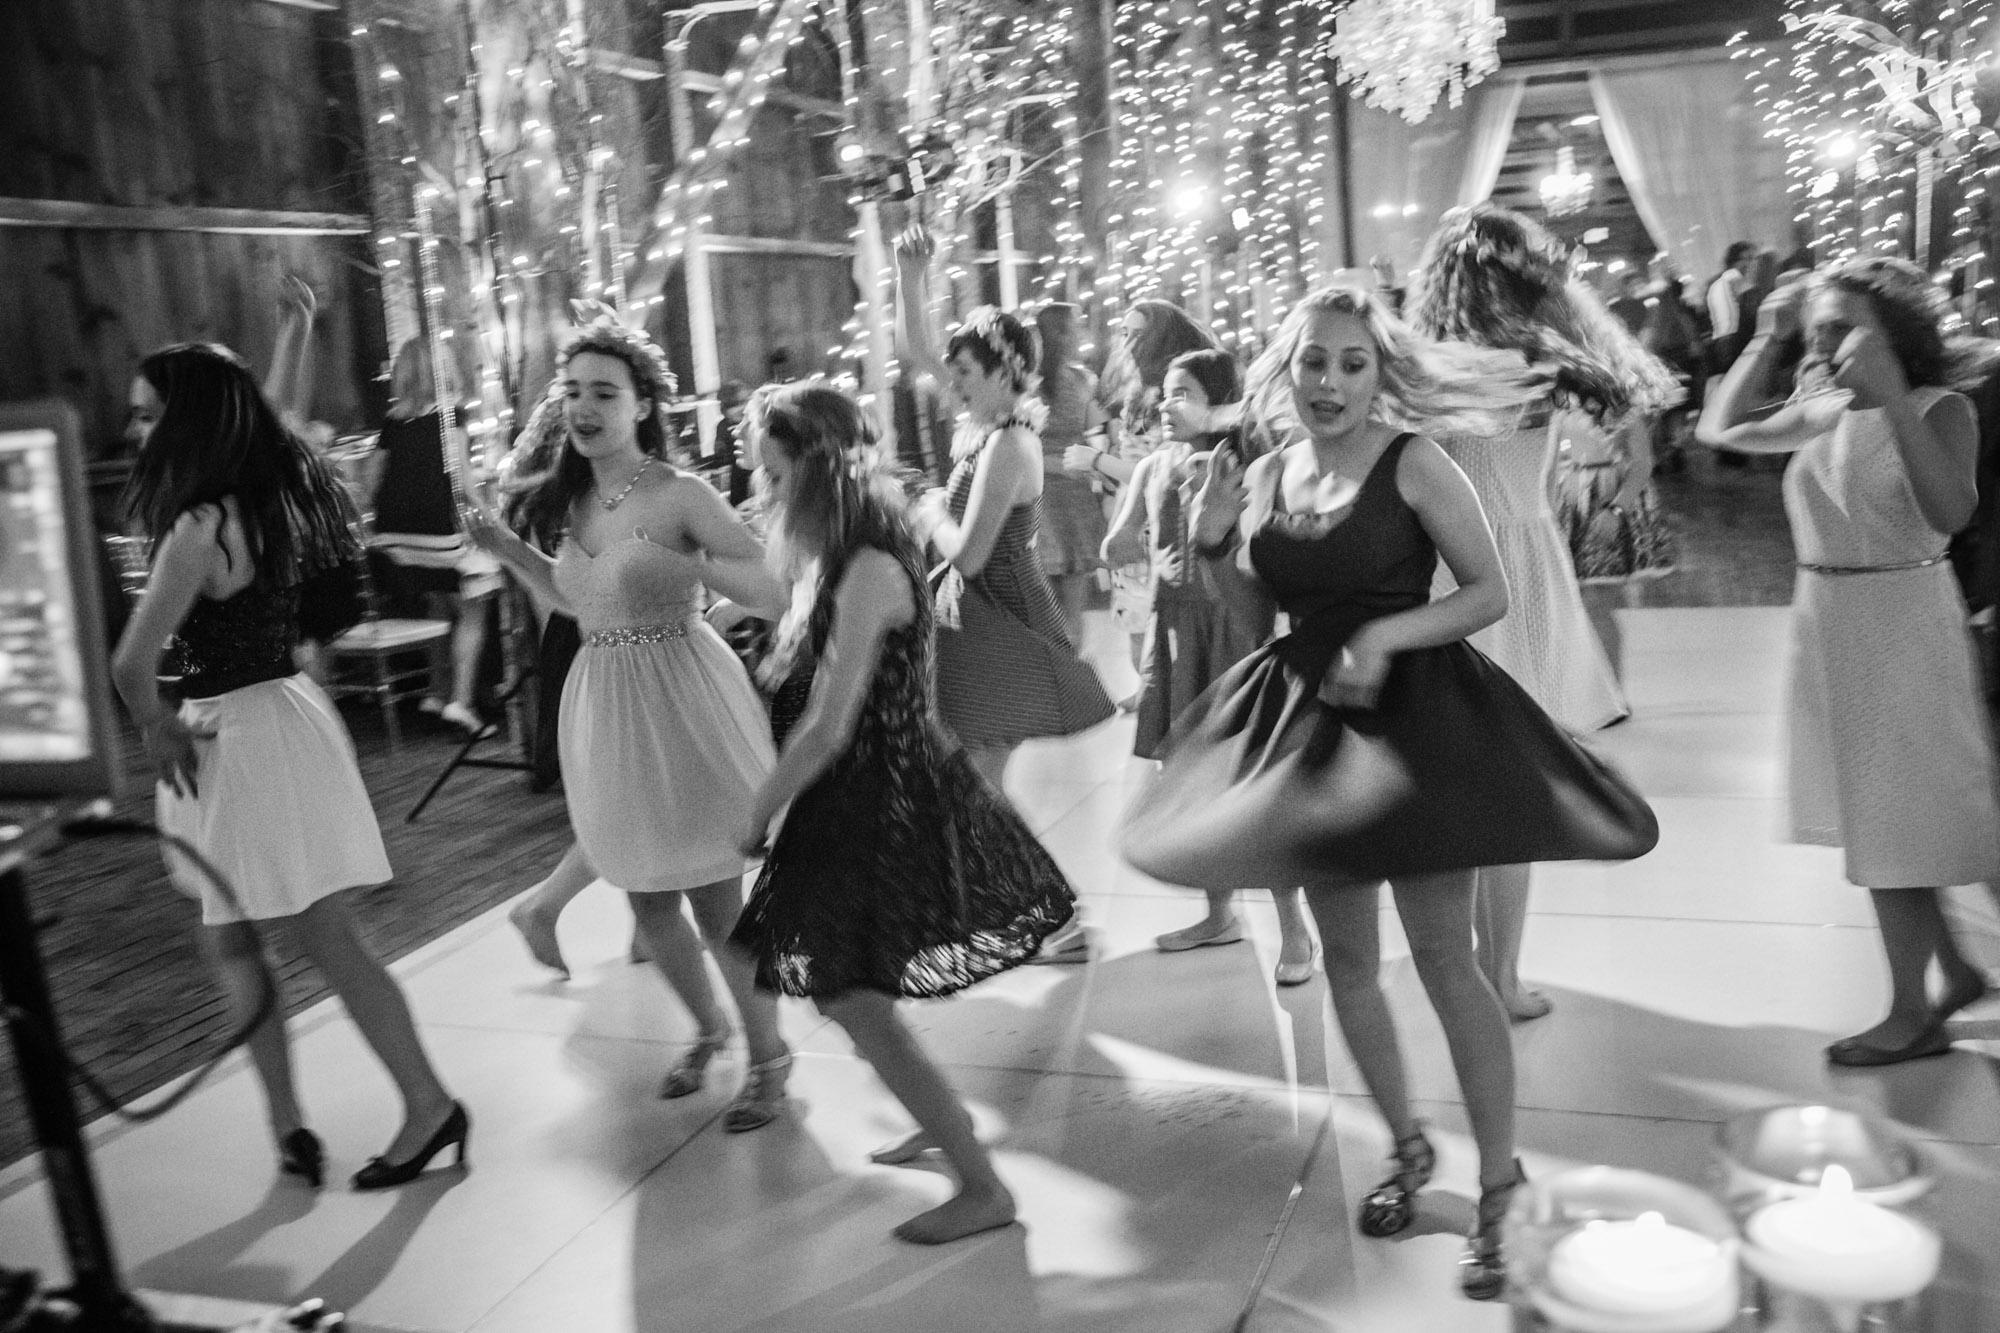 scranton_wedding_photographer_lettieri_pa (14 of 27).jpg